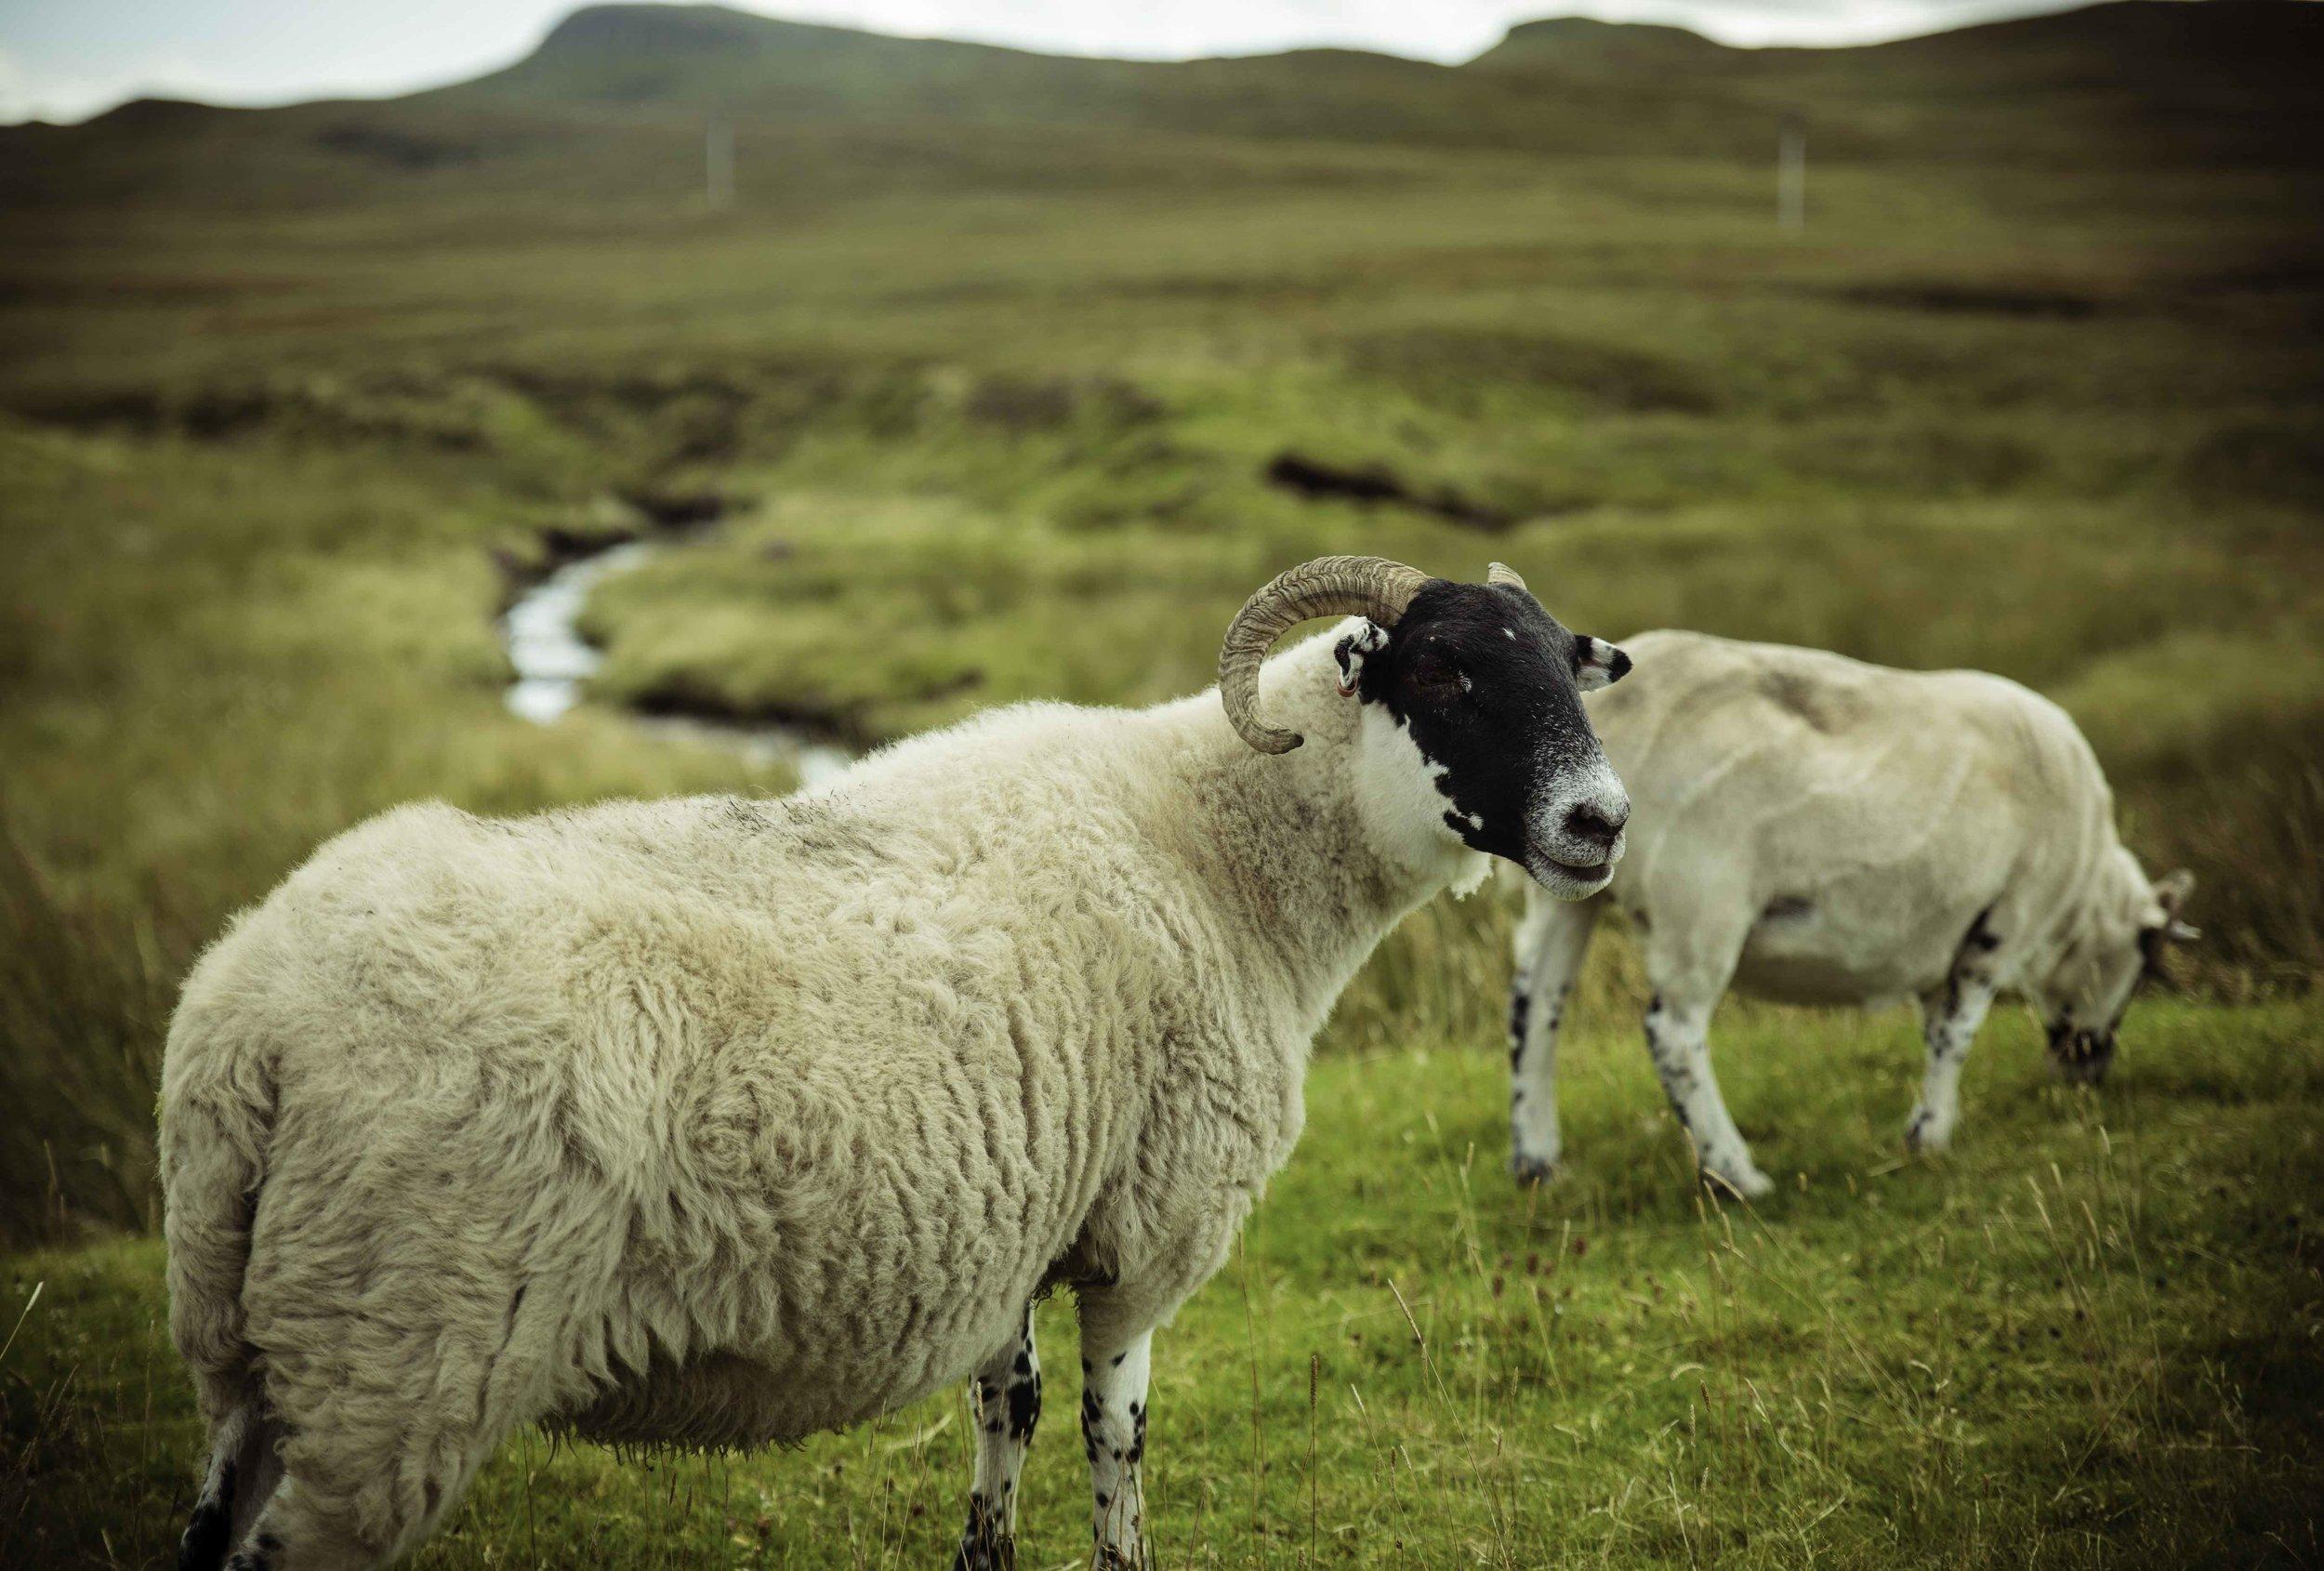 schotland-fotograferen-island-skye-schapen-natuurfotografie